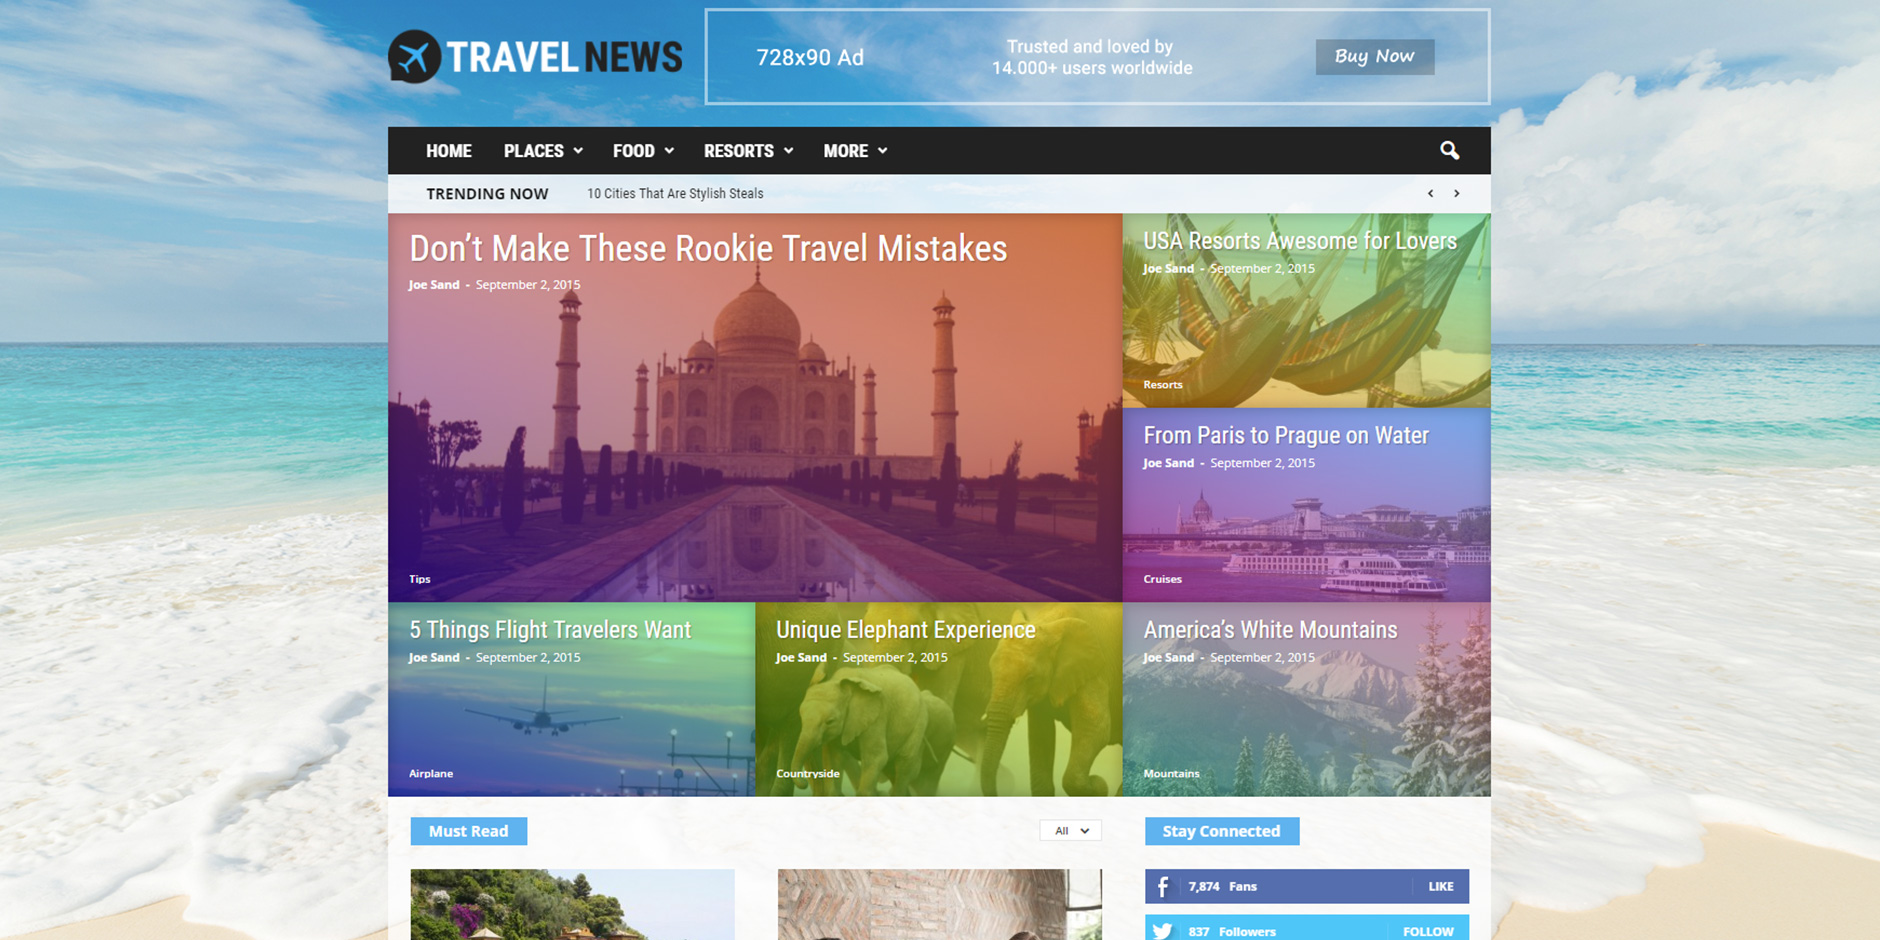 Newsmag_Travel_News_Demo